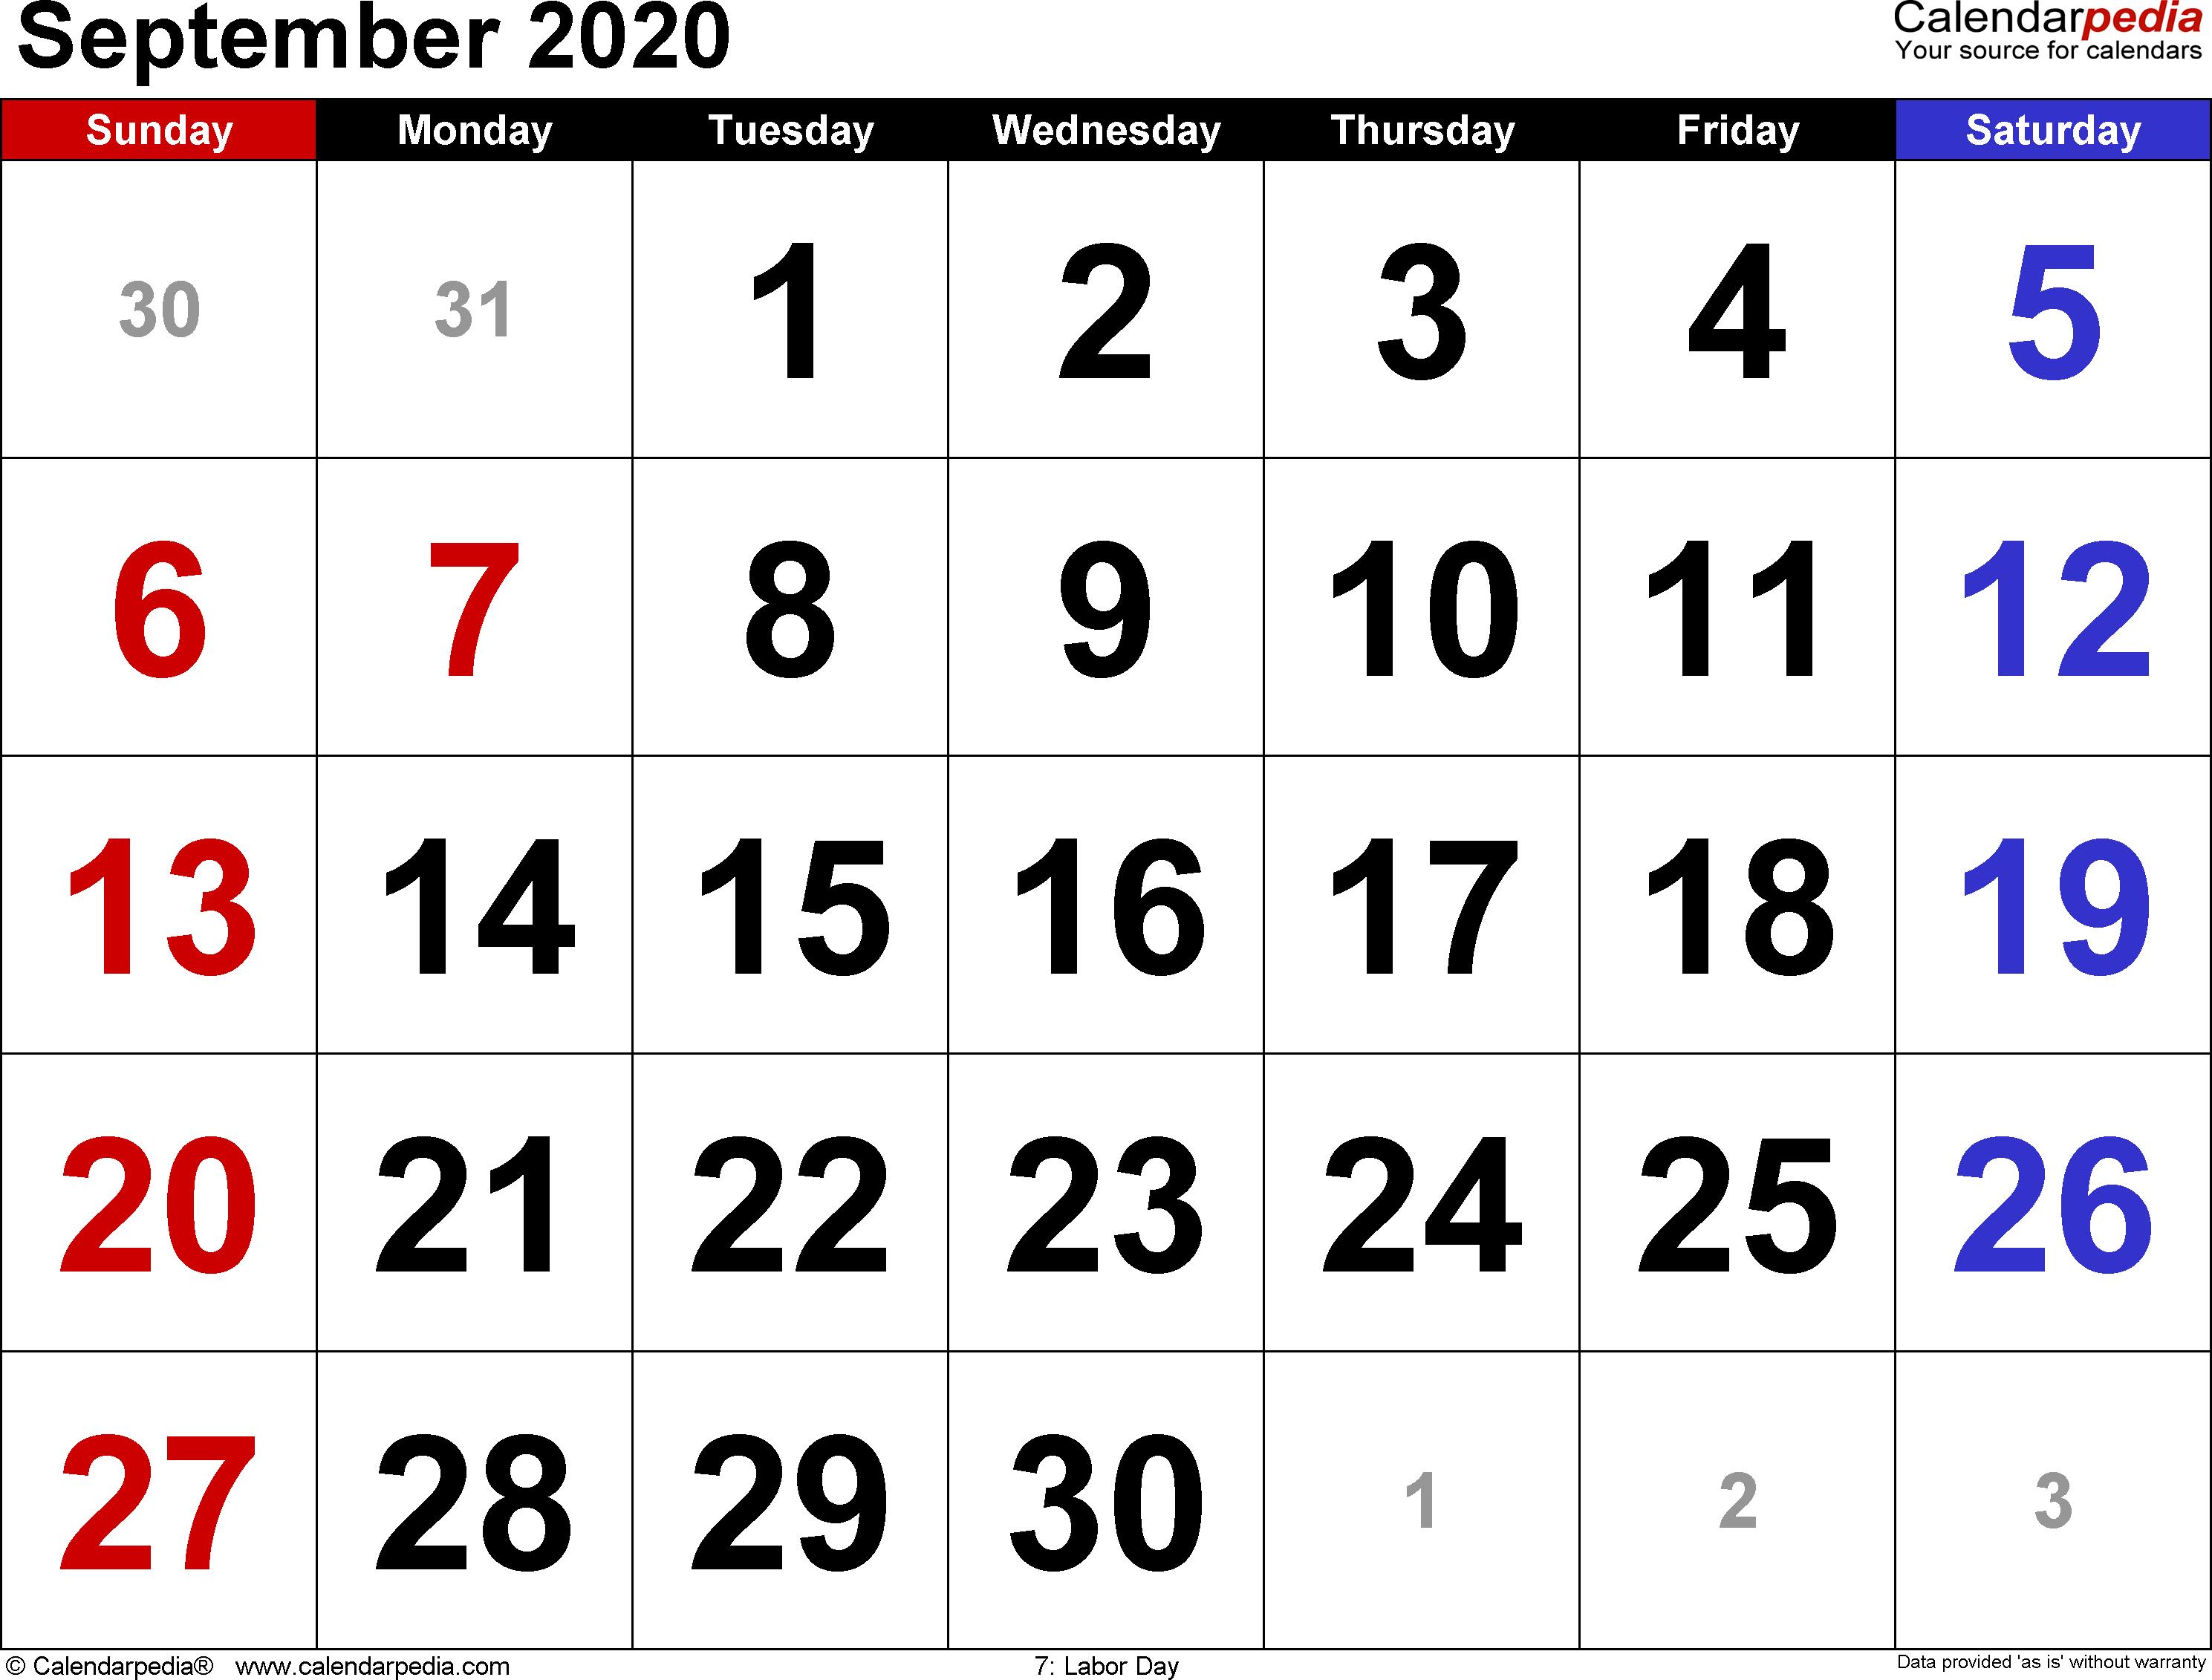 September 2020 Calendars For Word, Excel & Pdf